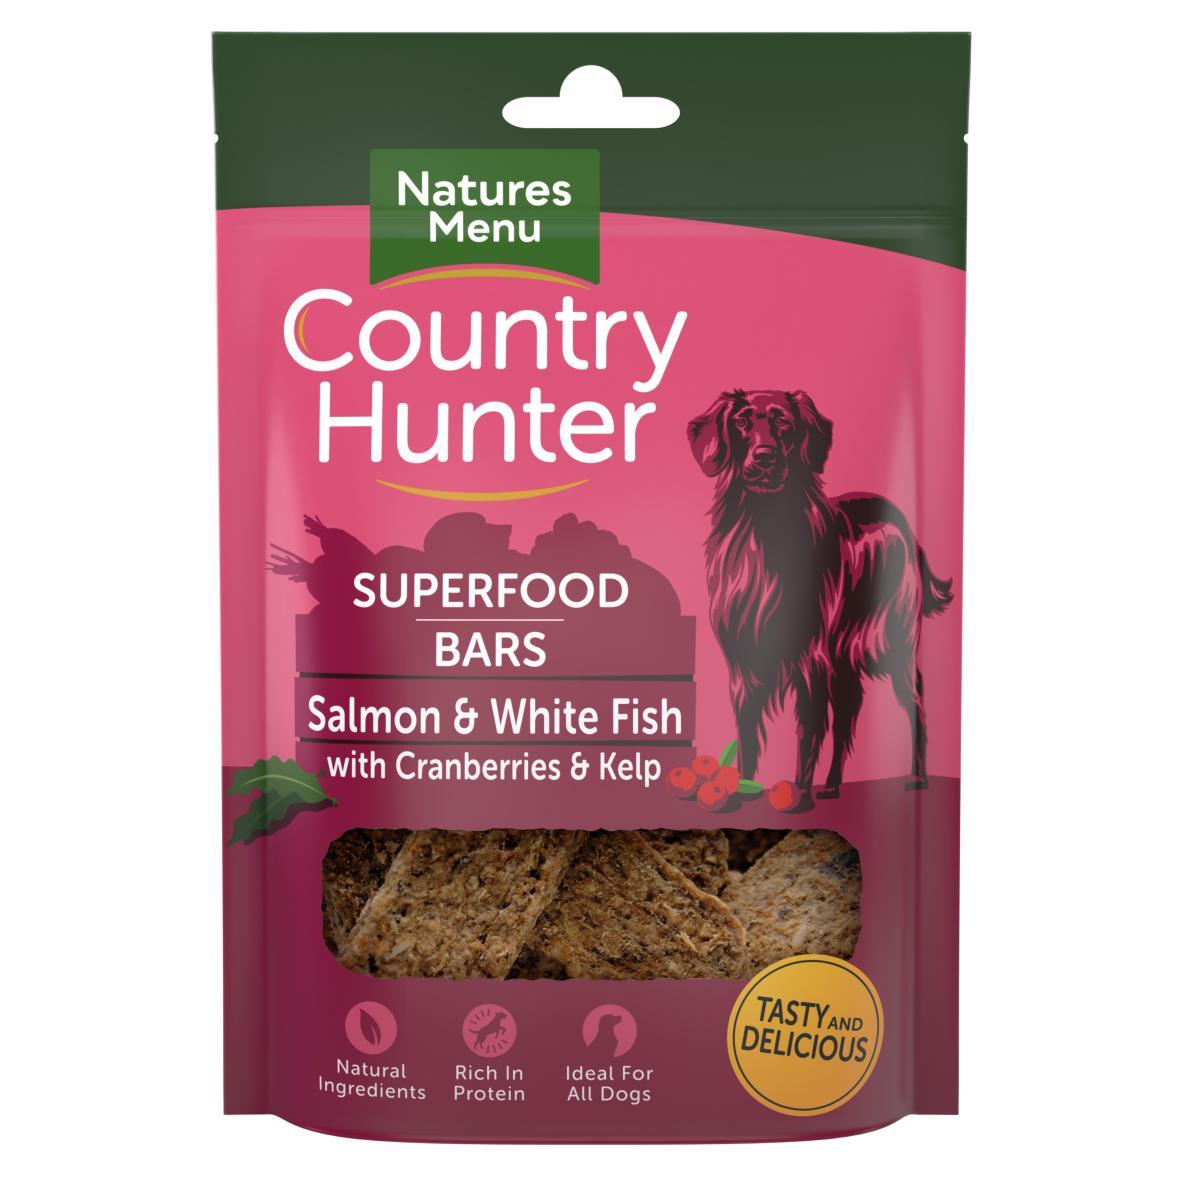 Natures Menu Country Hunter Superfood Bars Salmon & White Fish 100gm